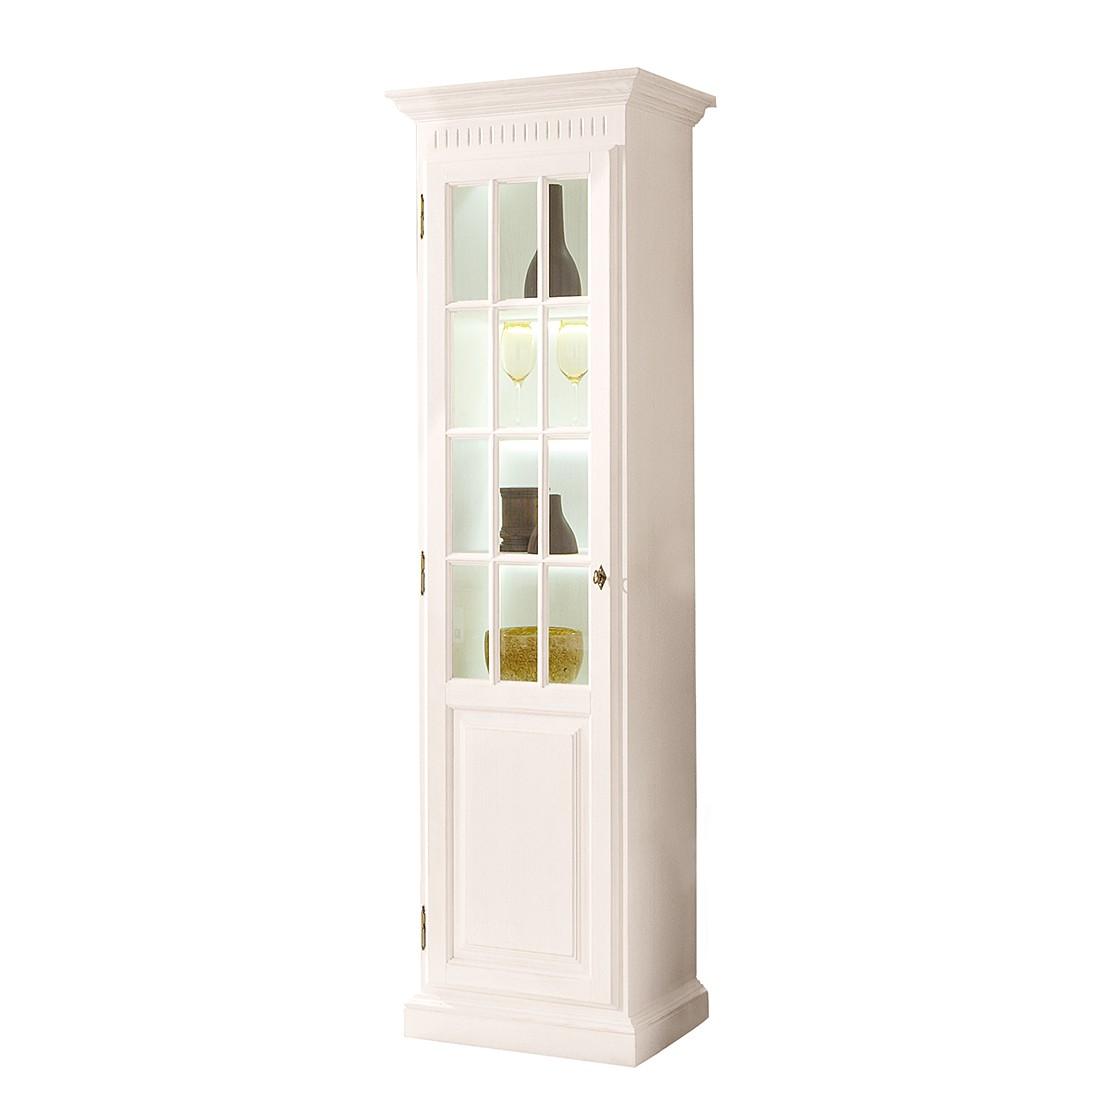 EEK A+, Armoire vitrine La Carlotta III - Pin massif - Crème - Avec éclairage, Landhaus Classic